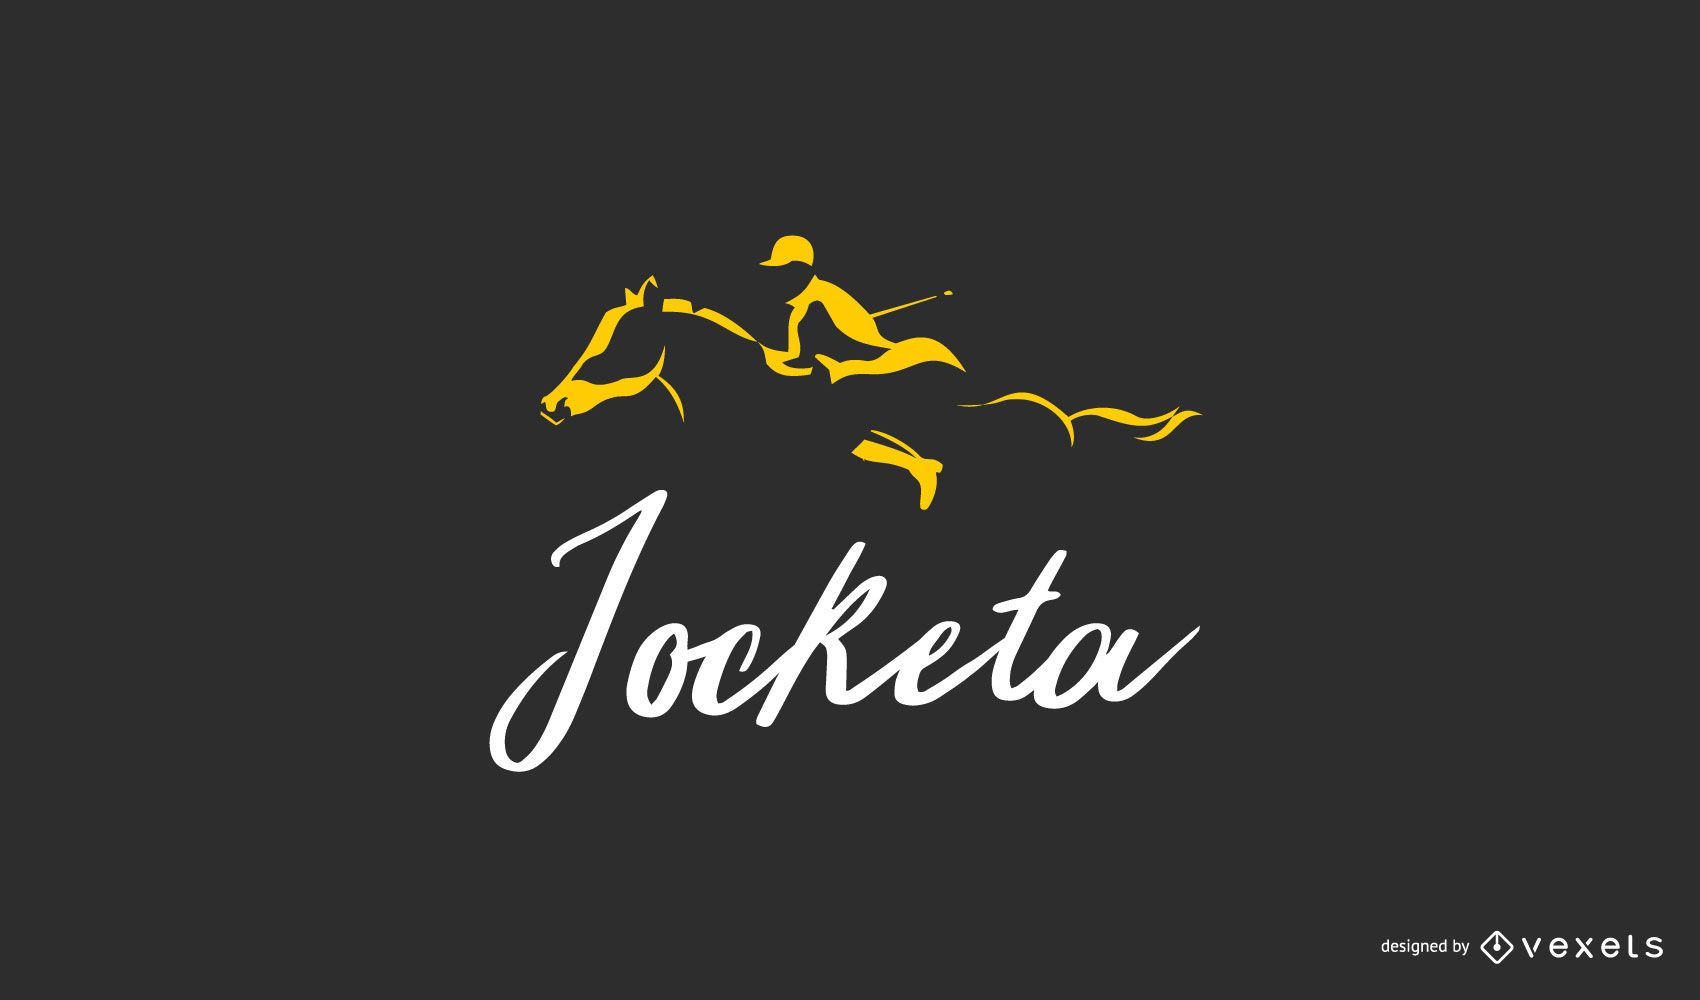 Jockey logo